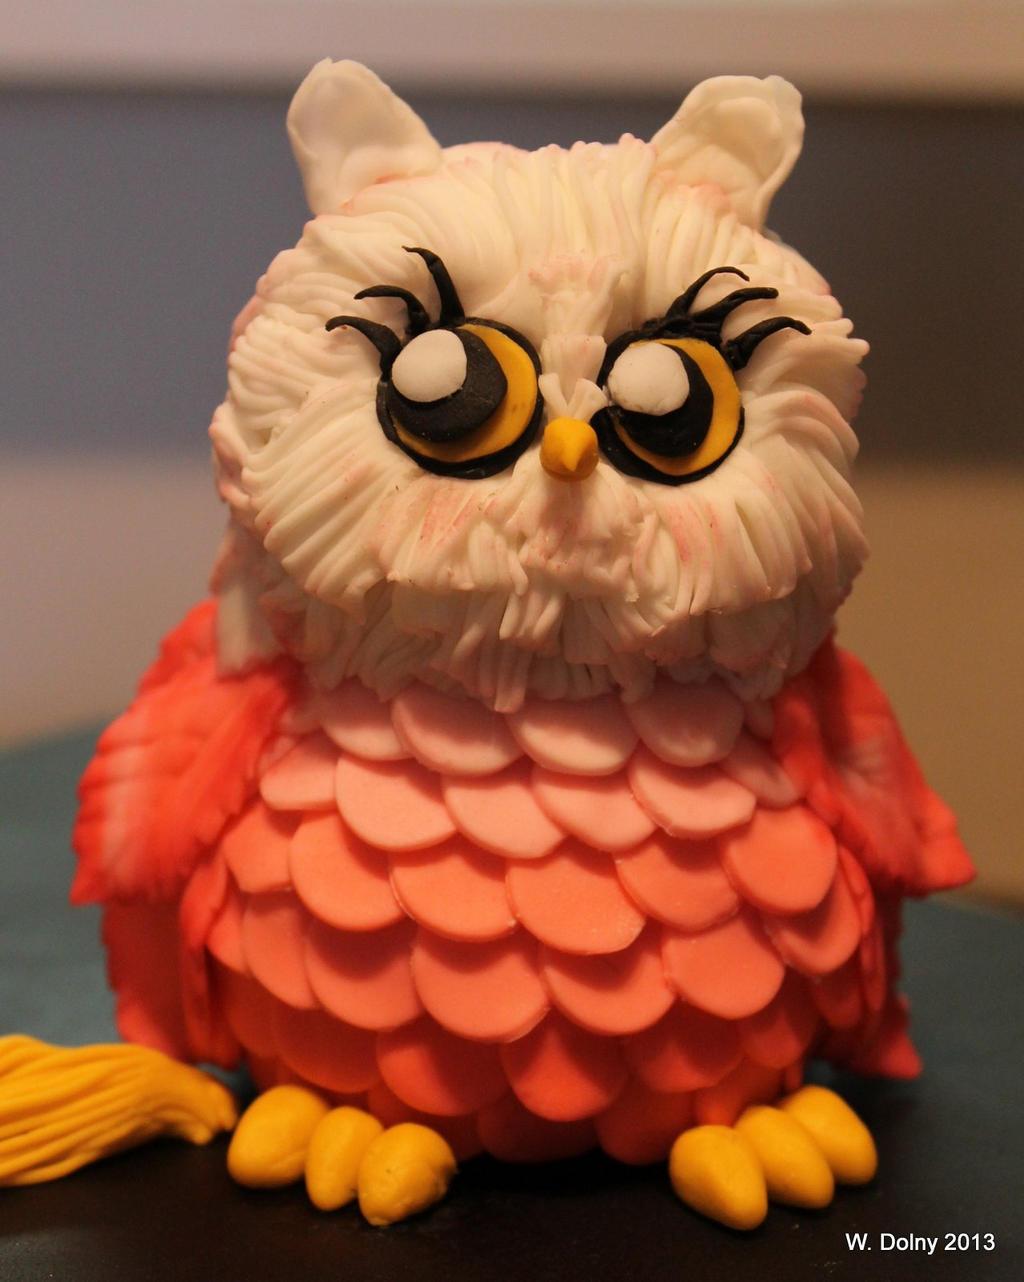 Wise Owl by lenslady